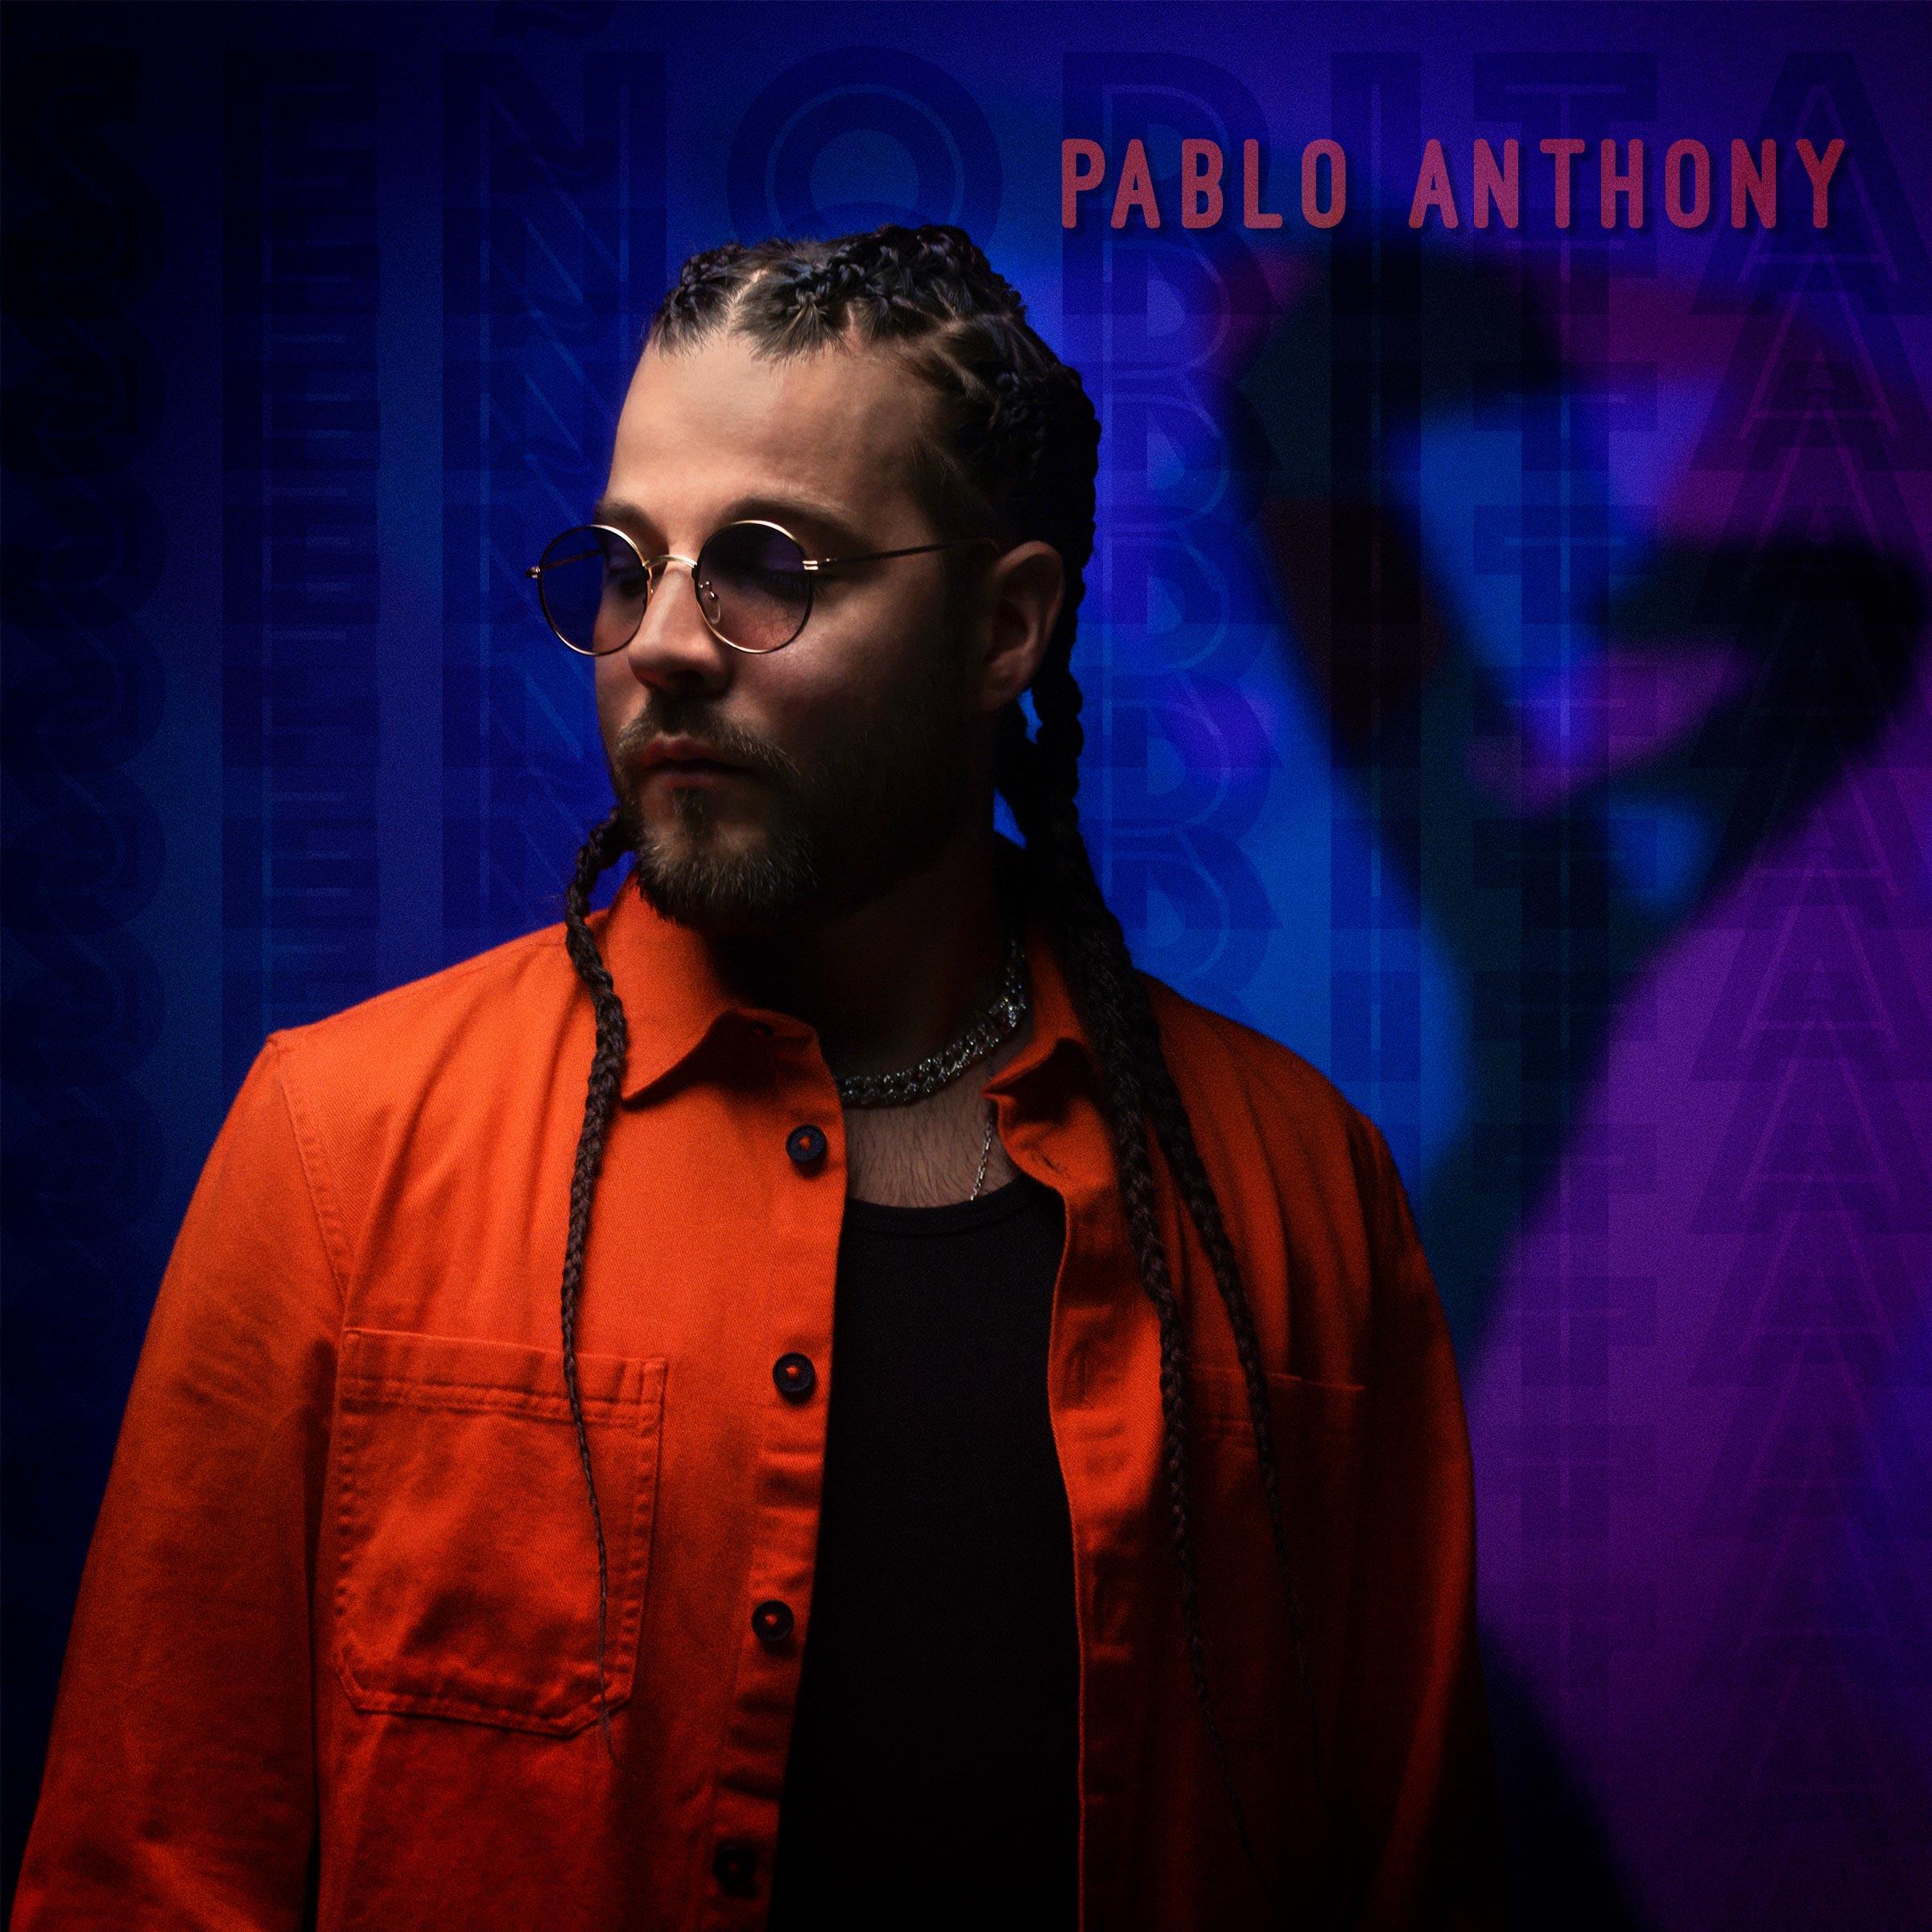 Pablo Anthony : Señorita (Jamafra Records)